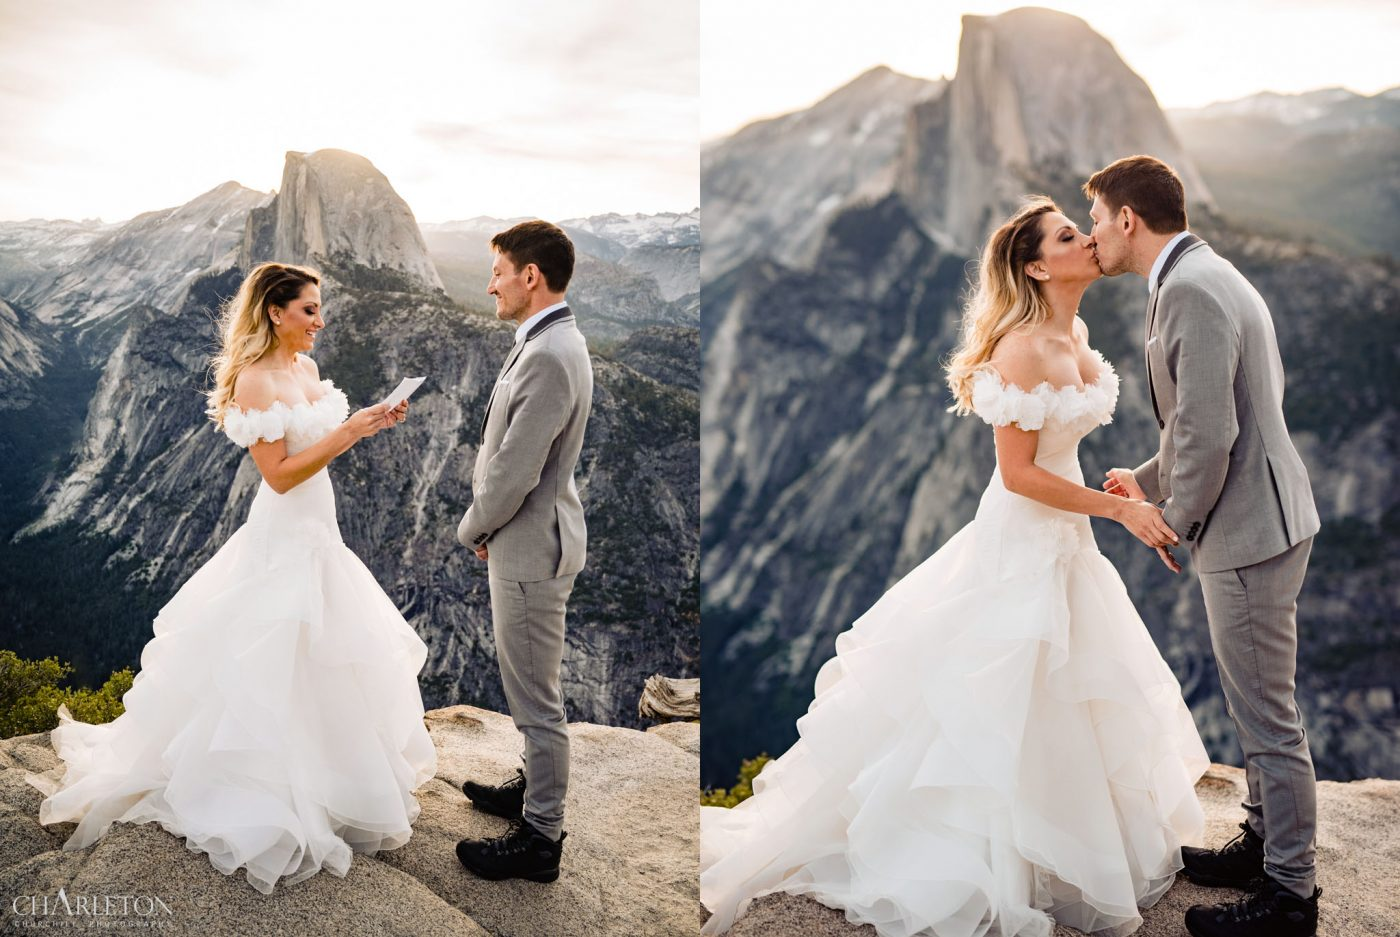 yosemite wedding ceremony permit at glacier point